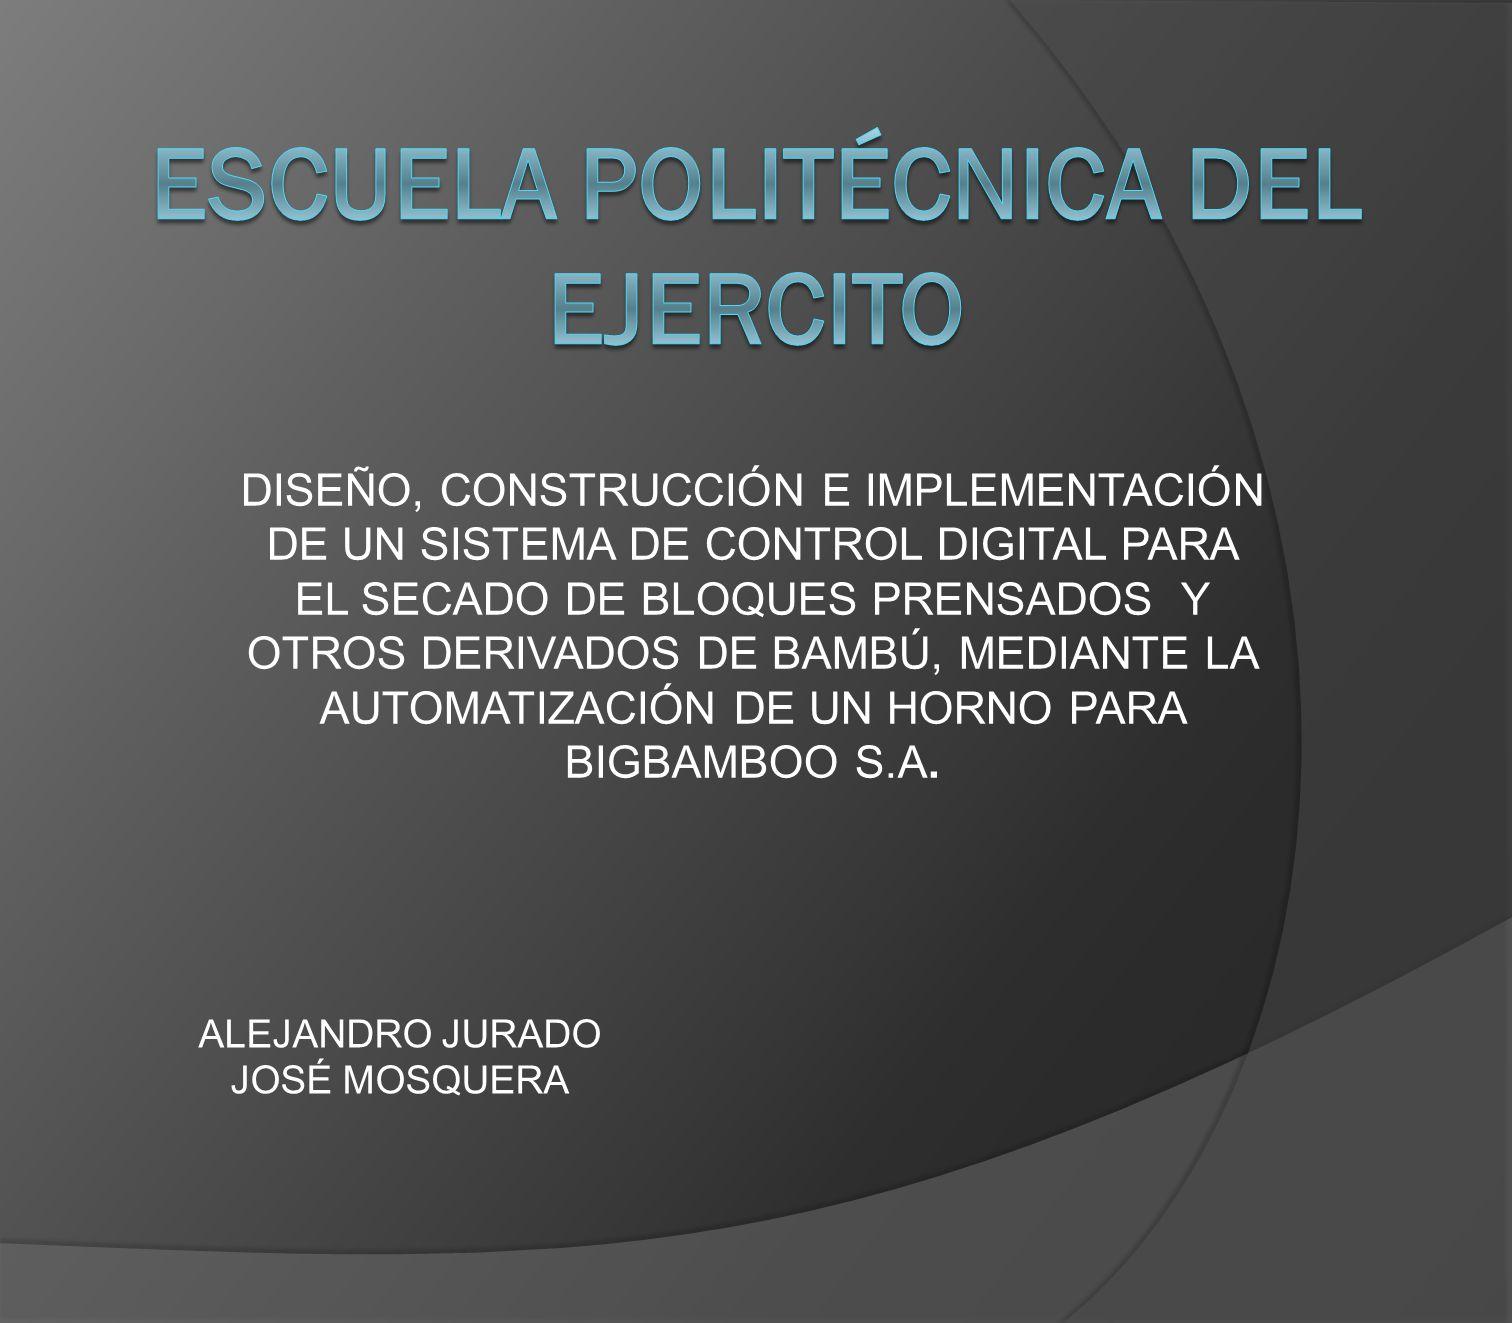 ESCUELA POLITÉCNICA DEL EJERCITO